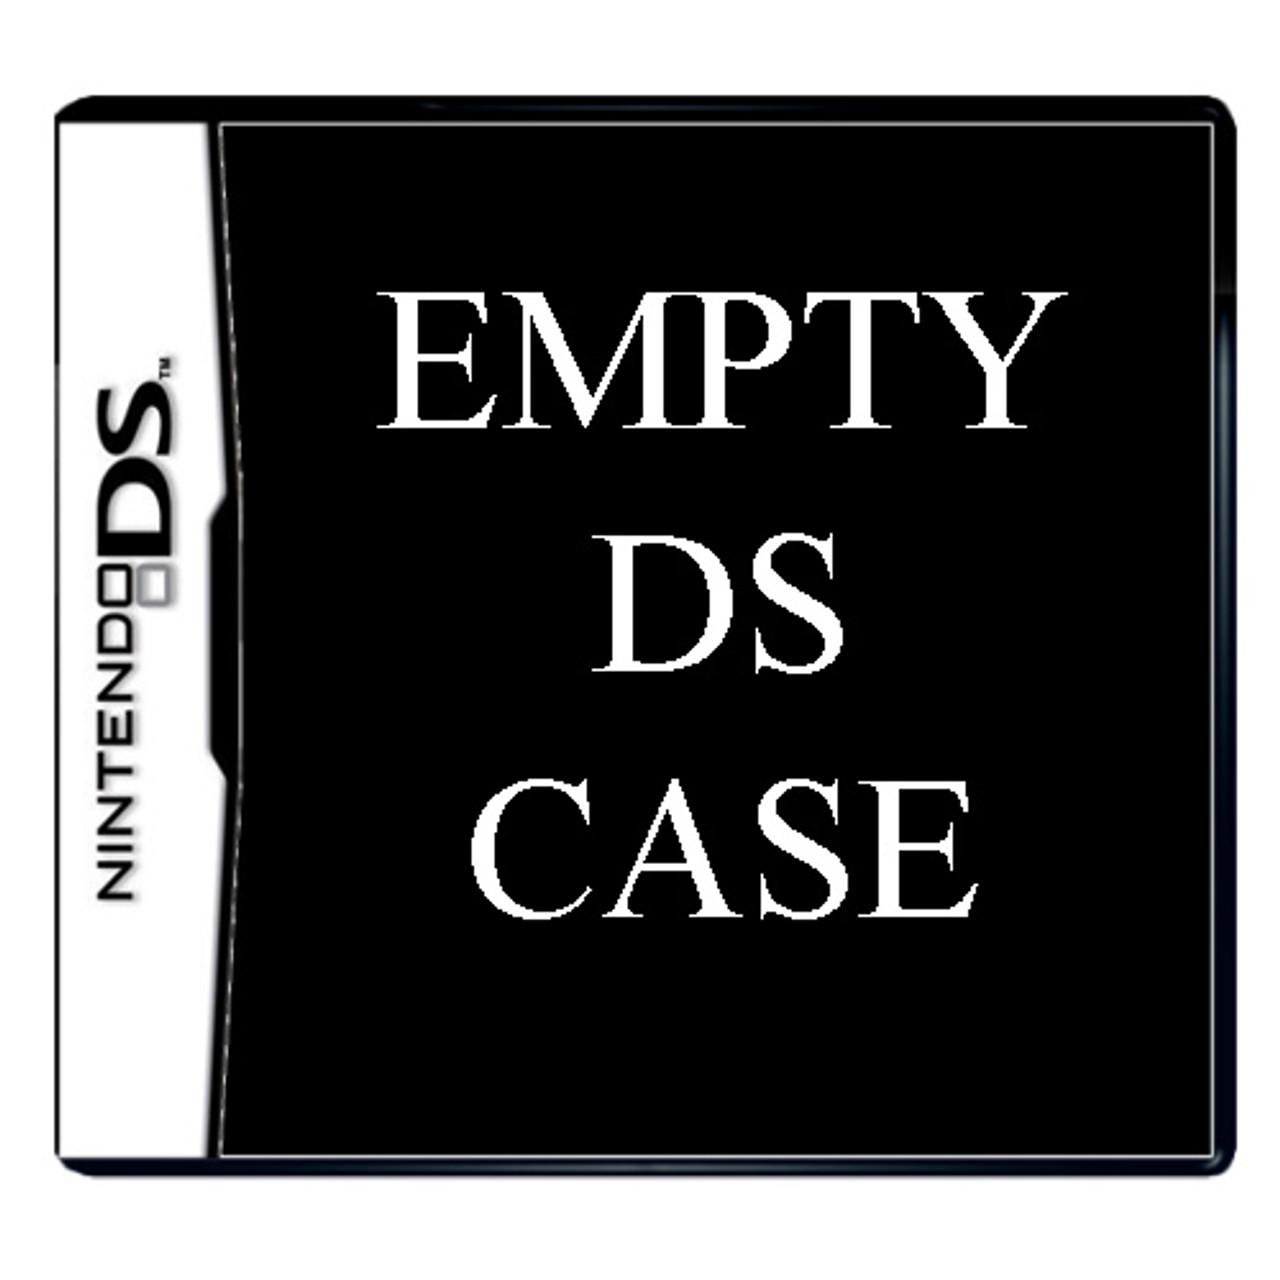 Super Mario 64 DS - Empty DS Case